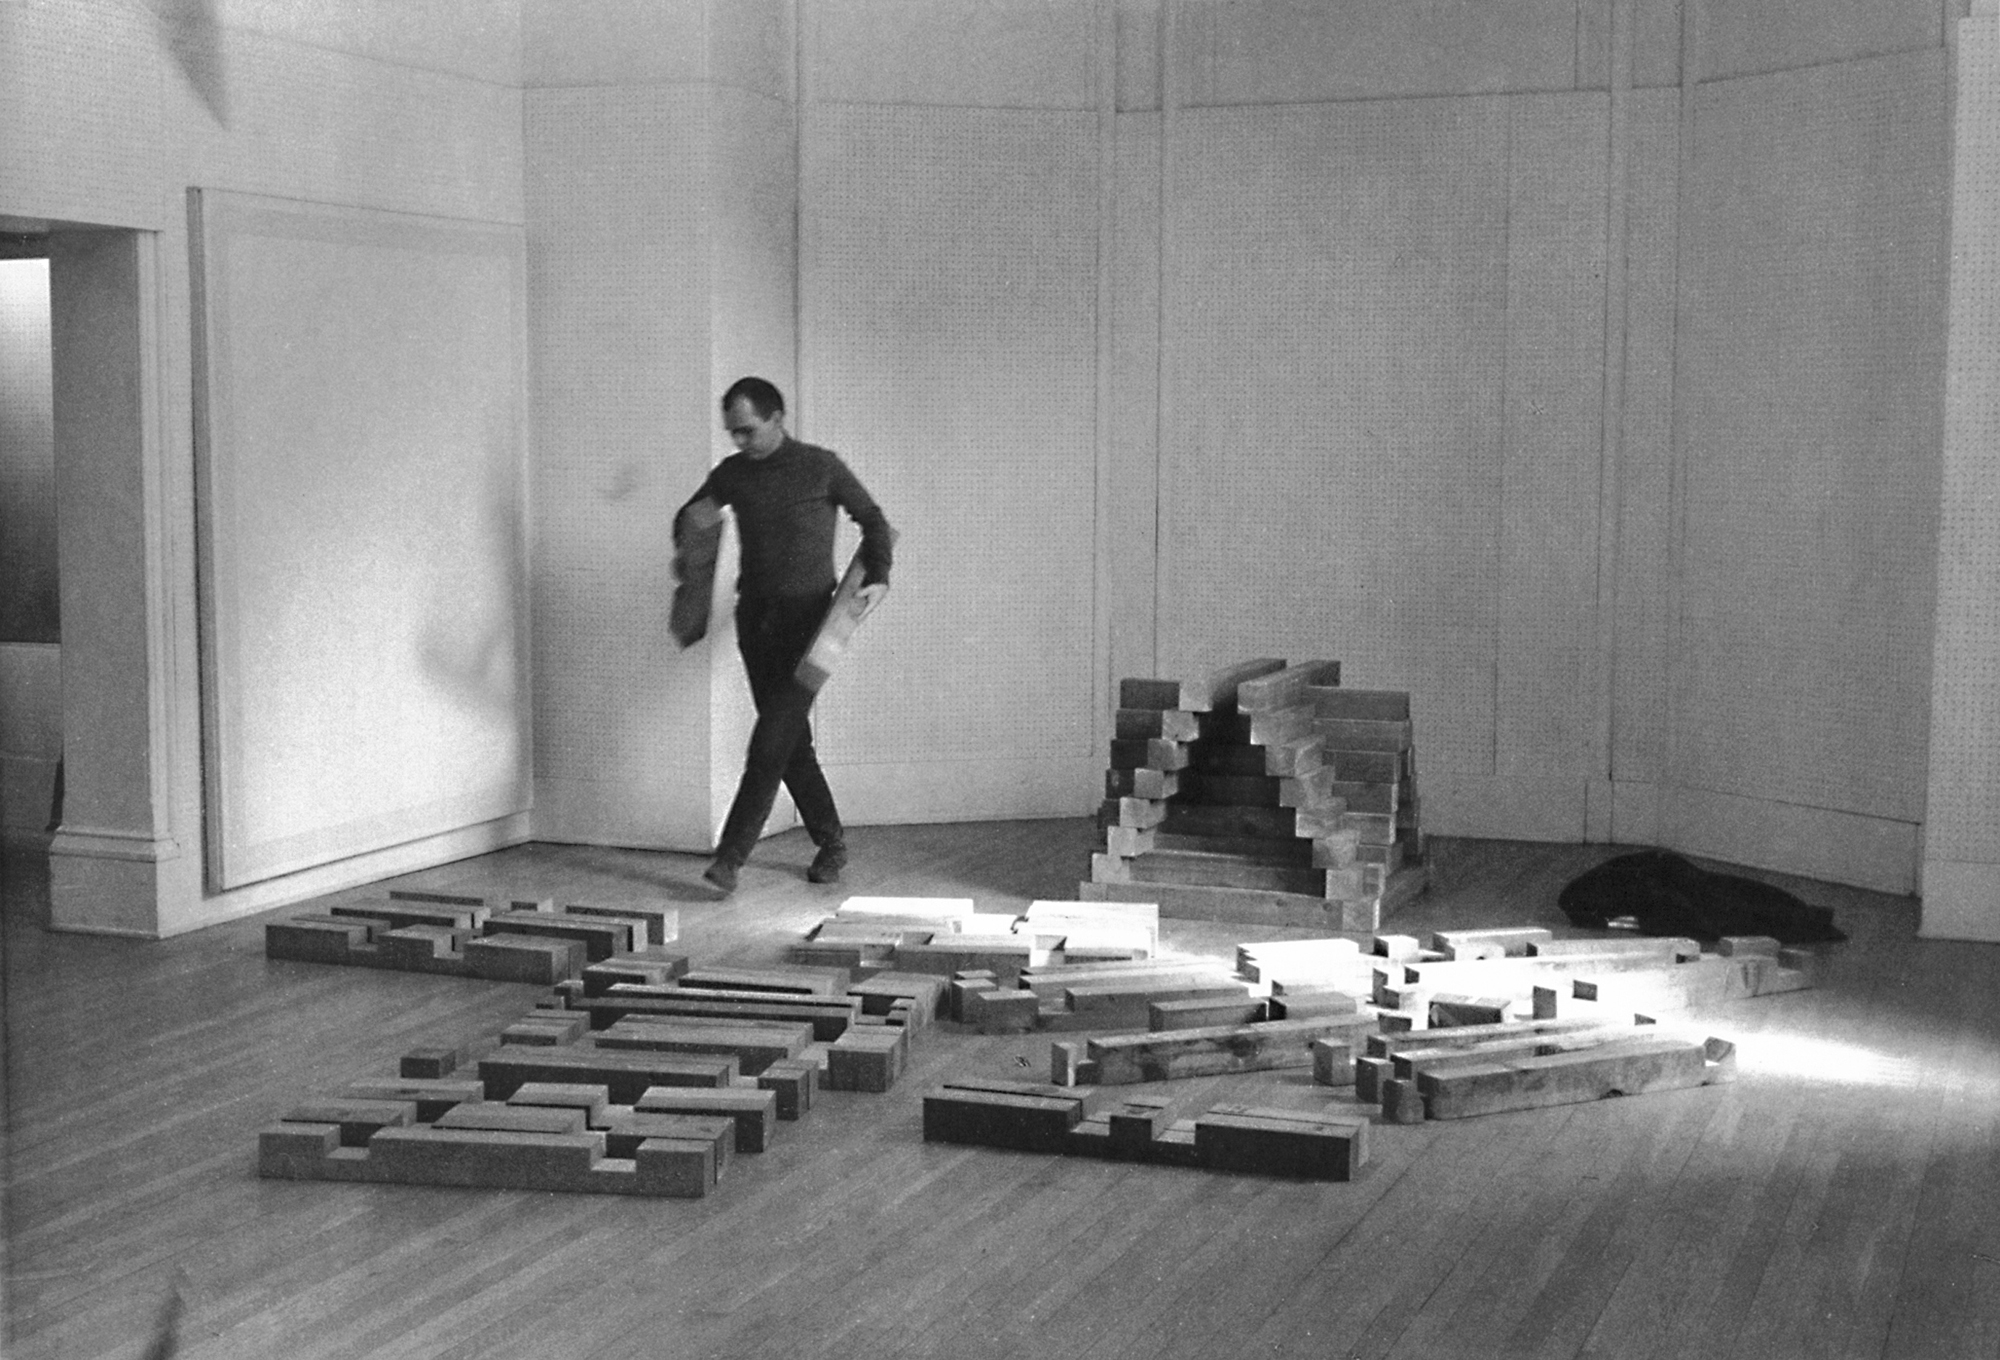 carl-andre-building-cedar-piece-1964-document-37-2000px.jpg